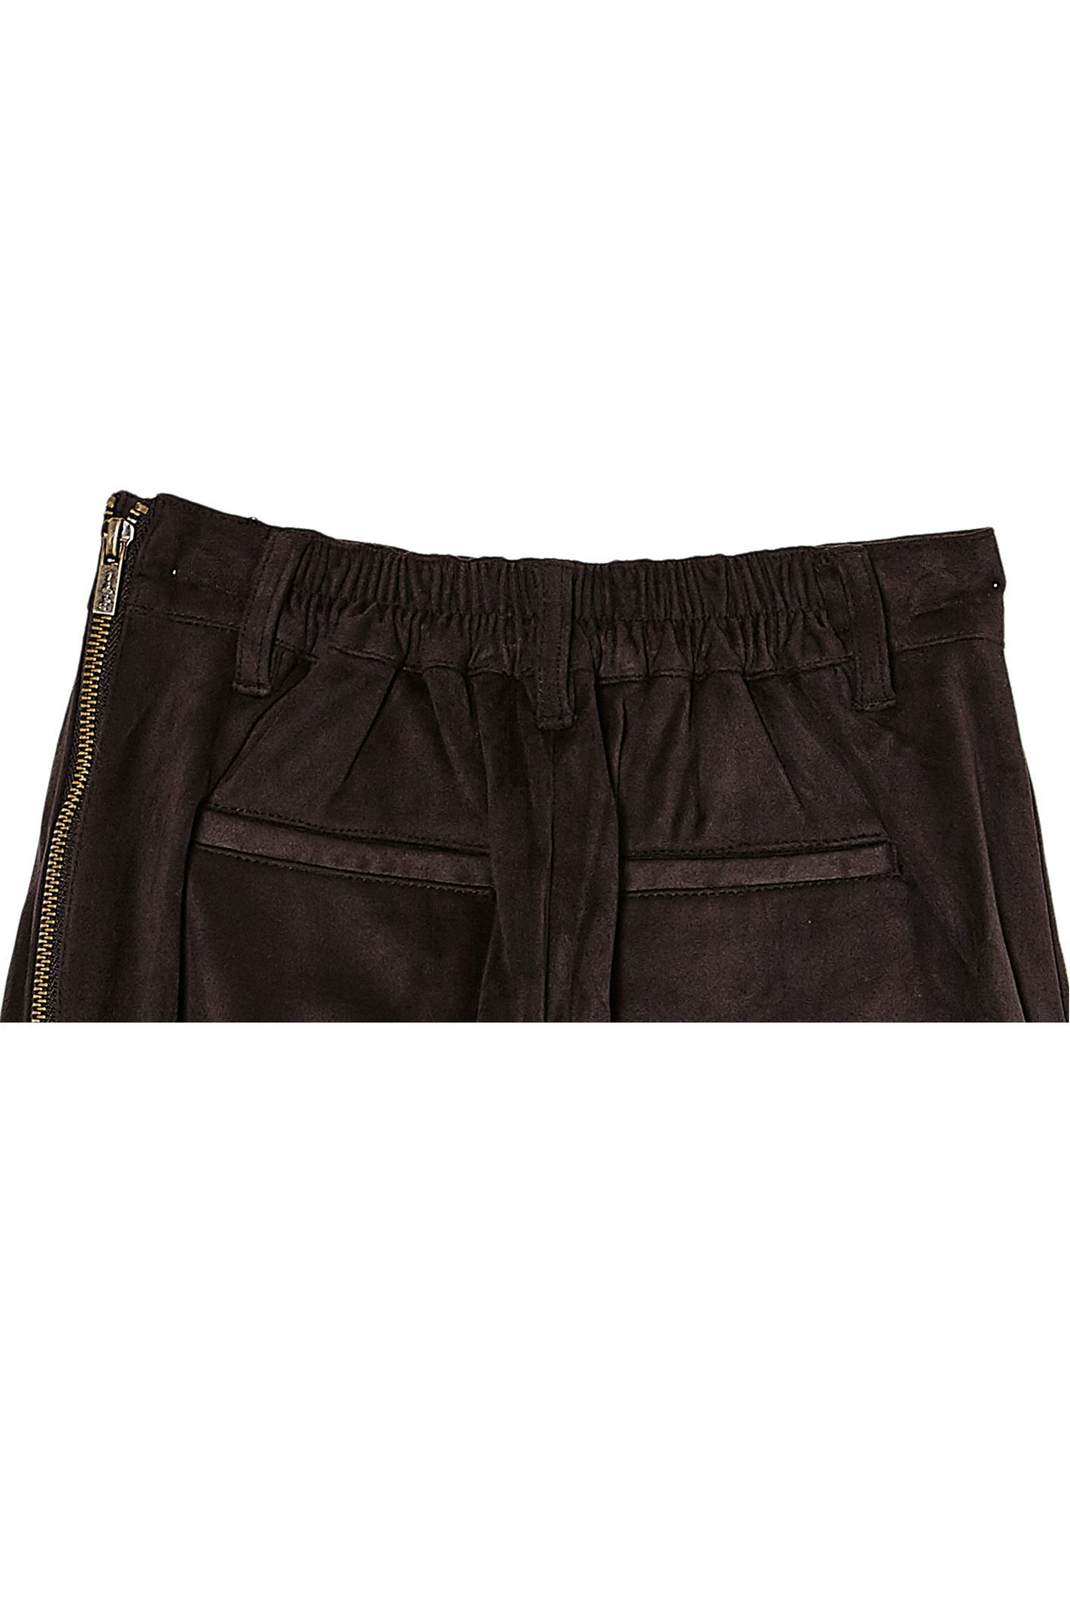 Bas  Pepe jeans PG900260 faye 999